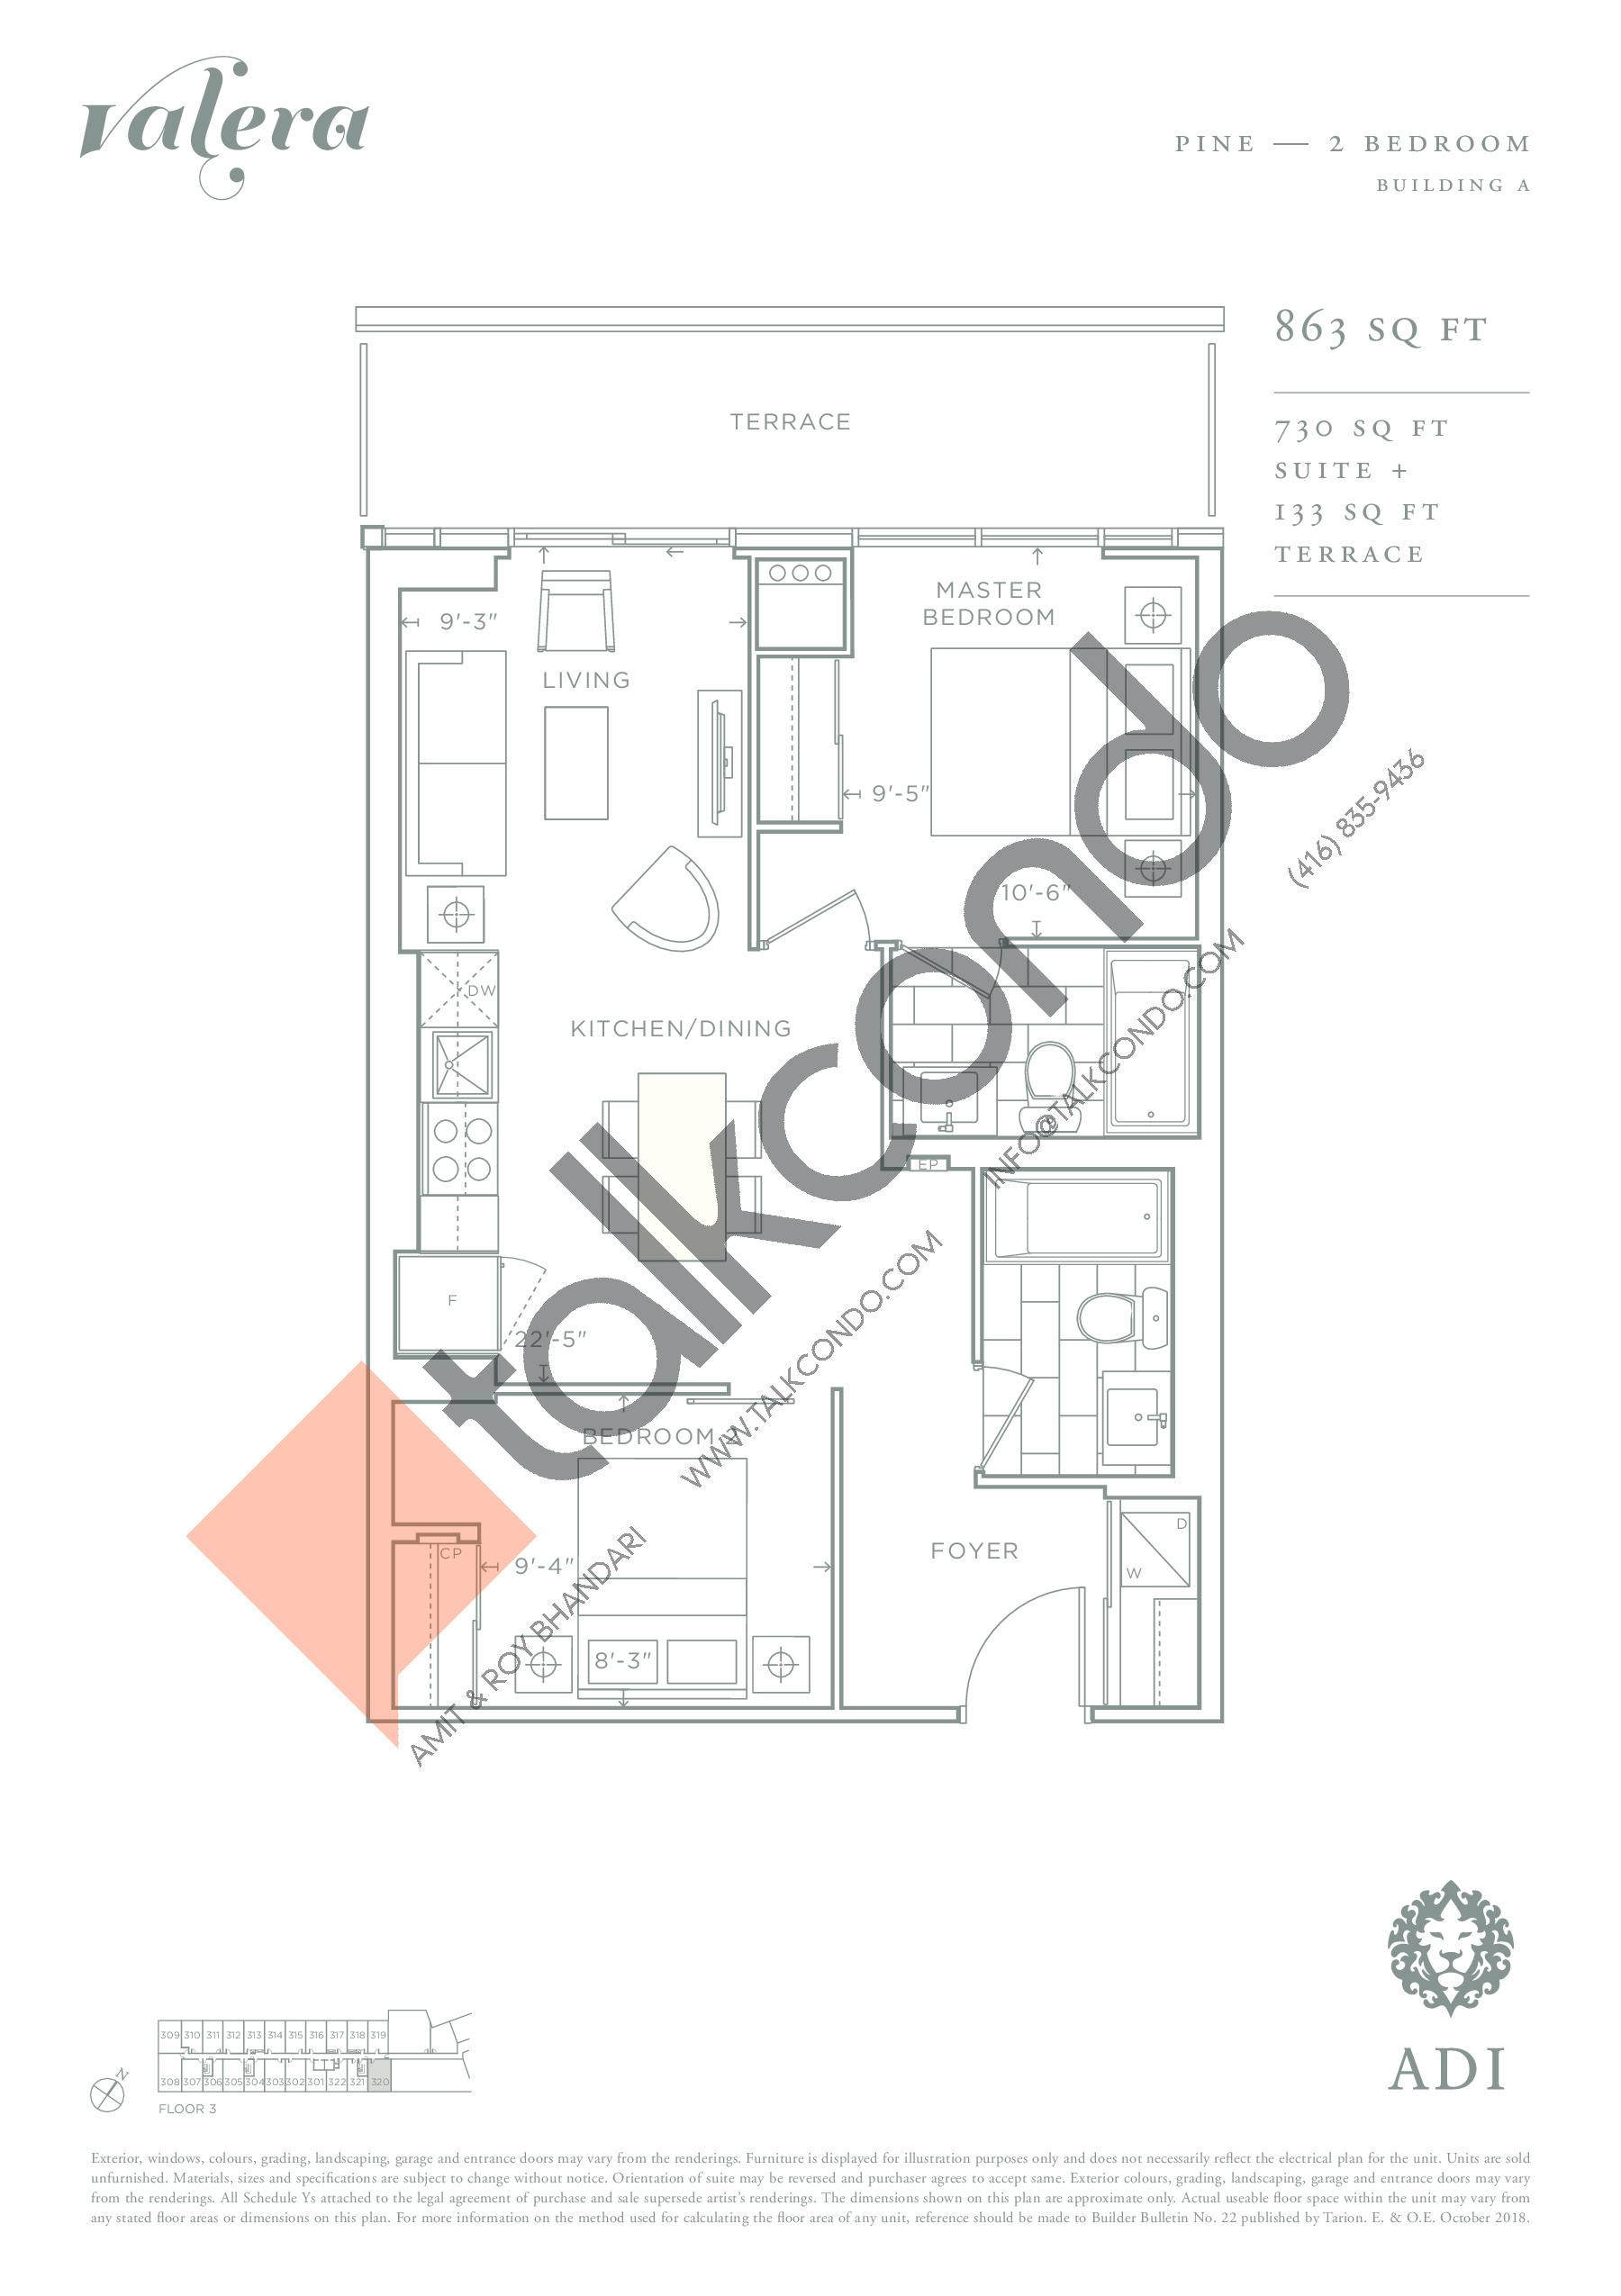 Pine Floor Plan at Valera Condos - 730 sq.ft